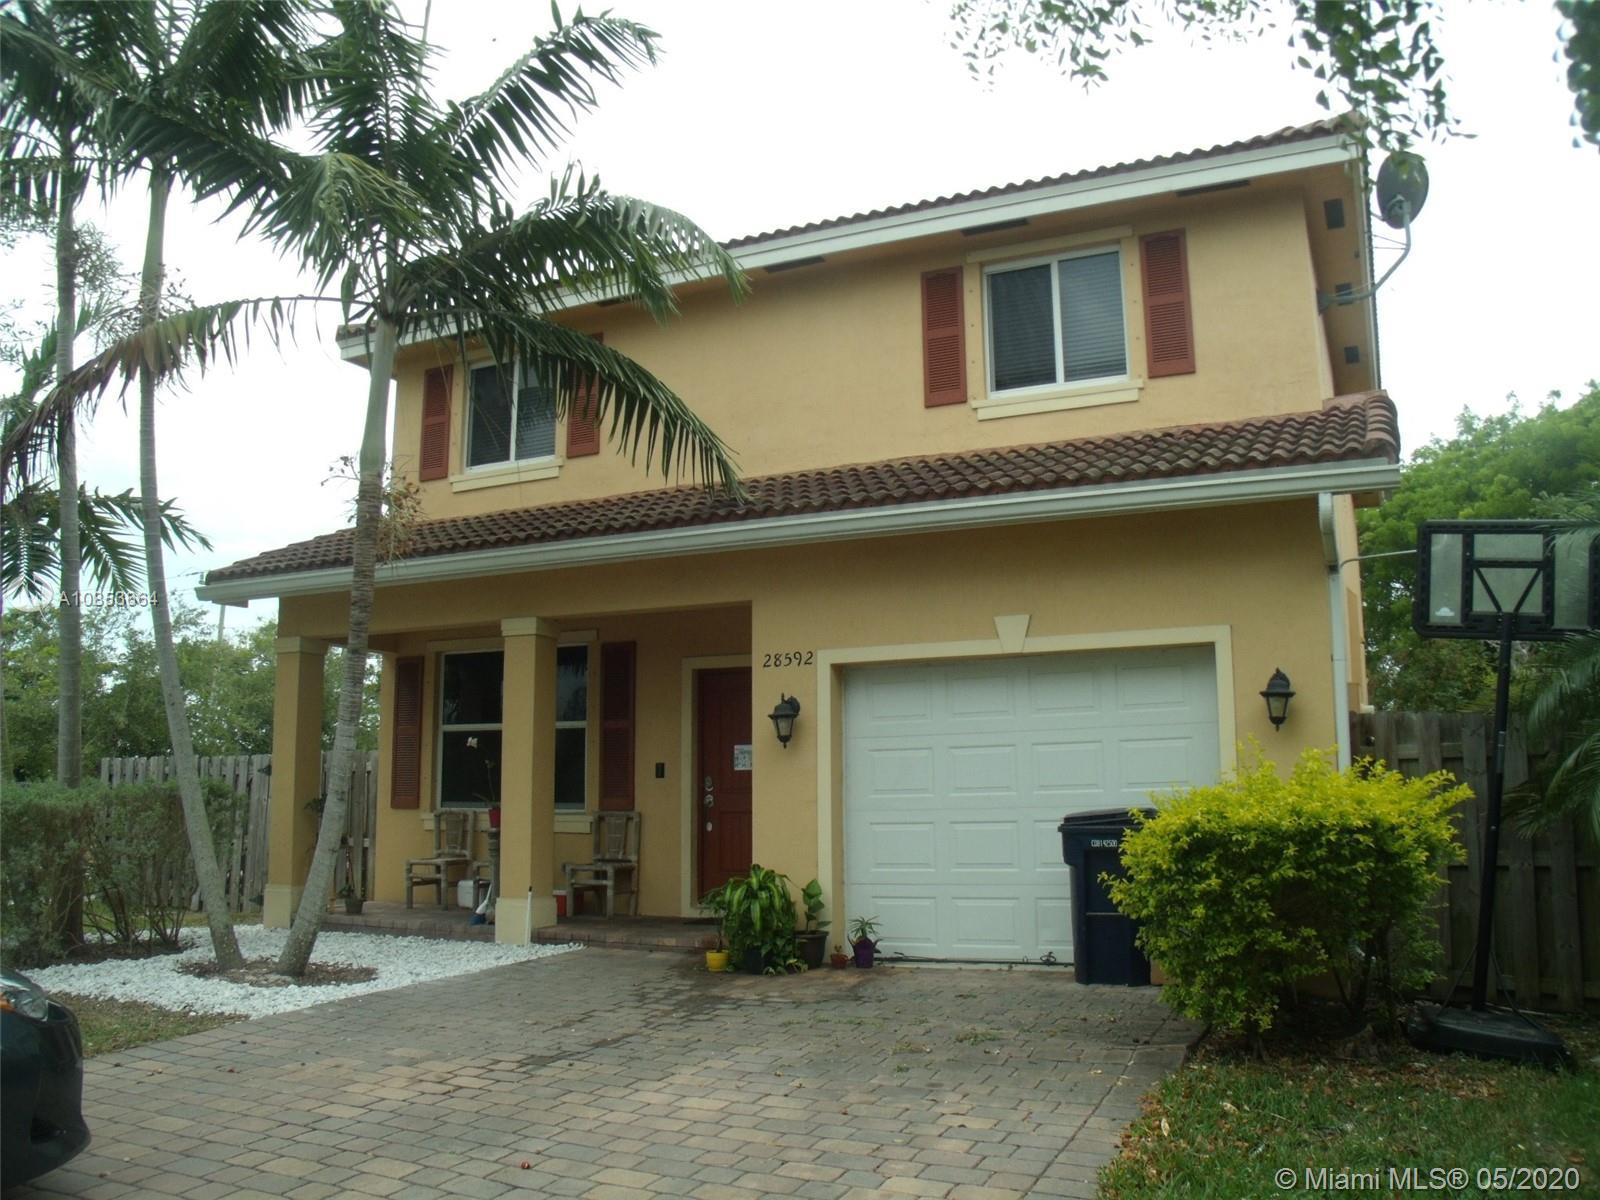 28592 SW 131st Ct, Homestead, FL 33033 - Homestead, FL real estate listing